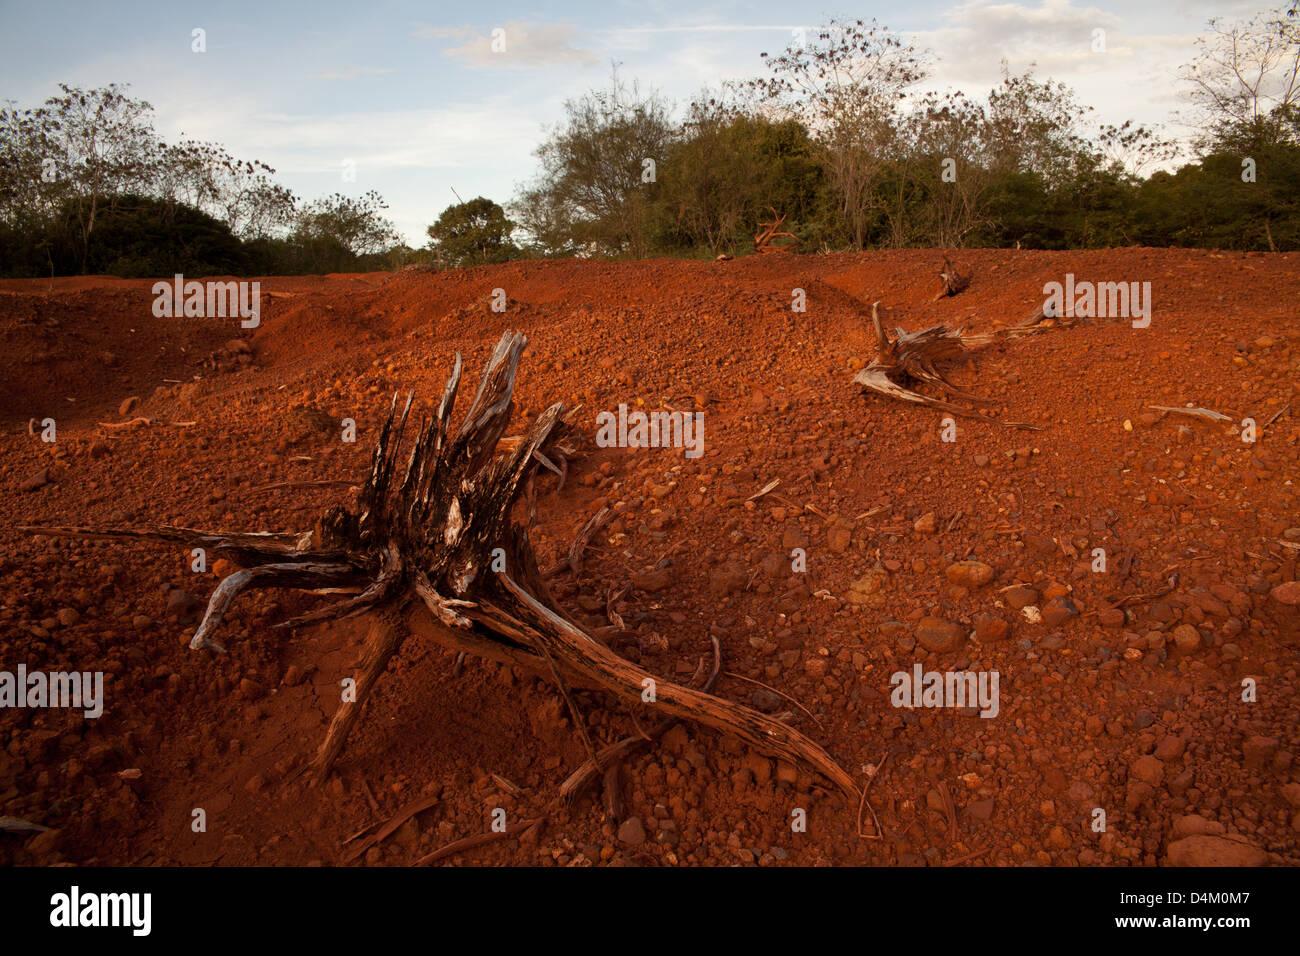 Desert landscape in Sarigua national park, Herrera province, Republic of Panama. Stock Photo